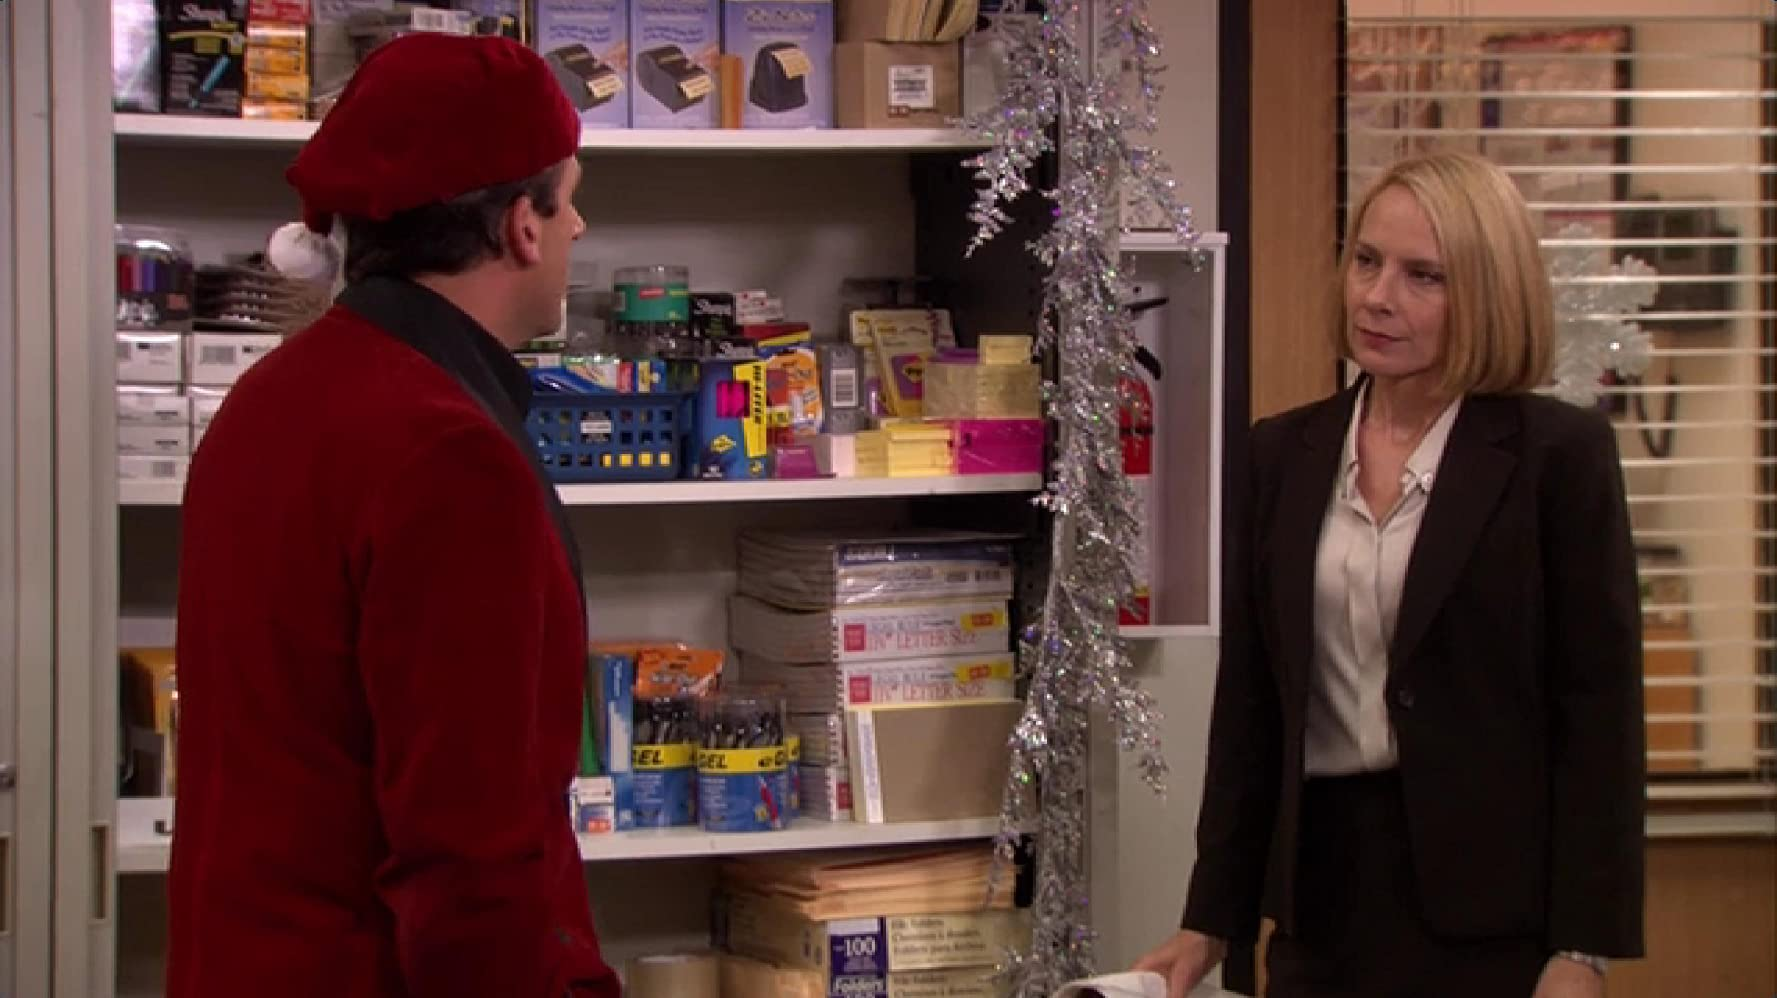 classy christmas 2010 - The Office Classy Christmas